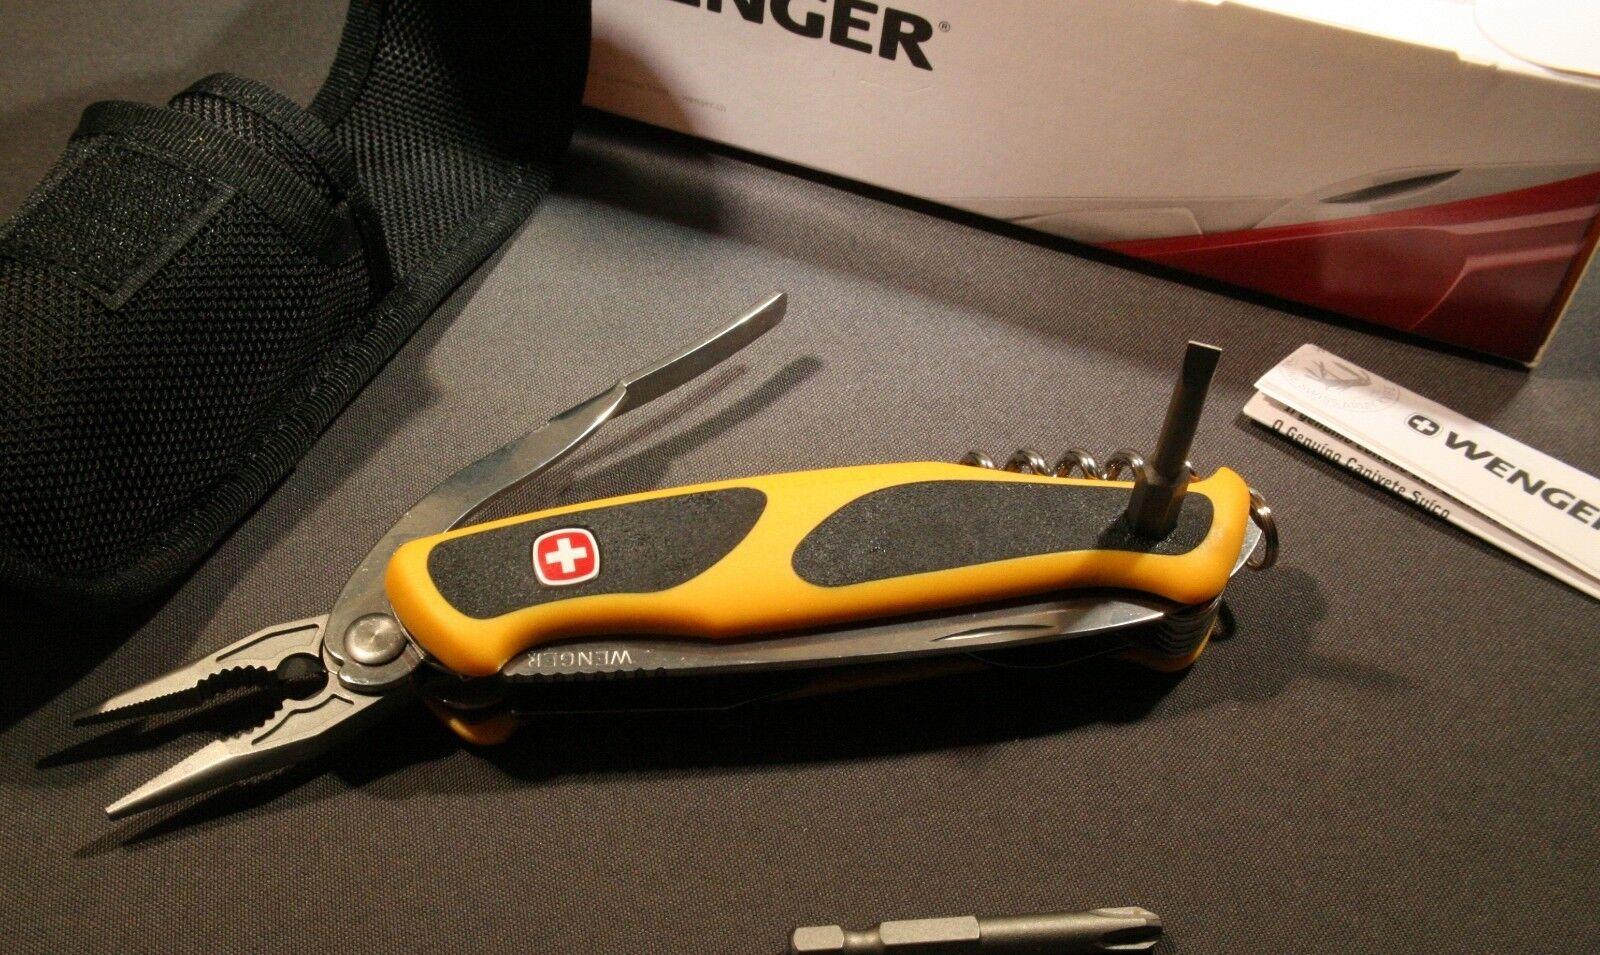 Coltellino SVIZZERO WENGER RANGER 174 (oggi  VICTORINOX), Swiss Army Knife